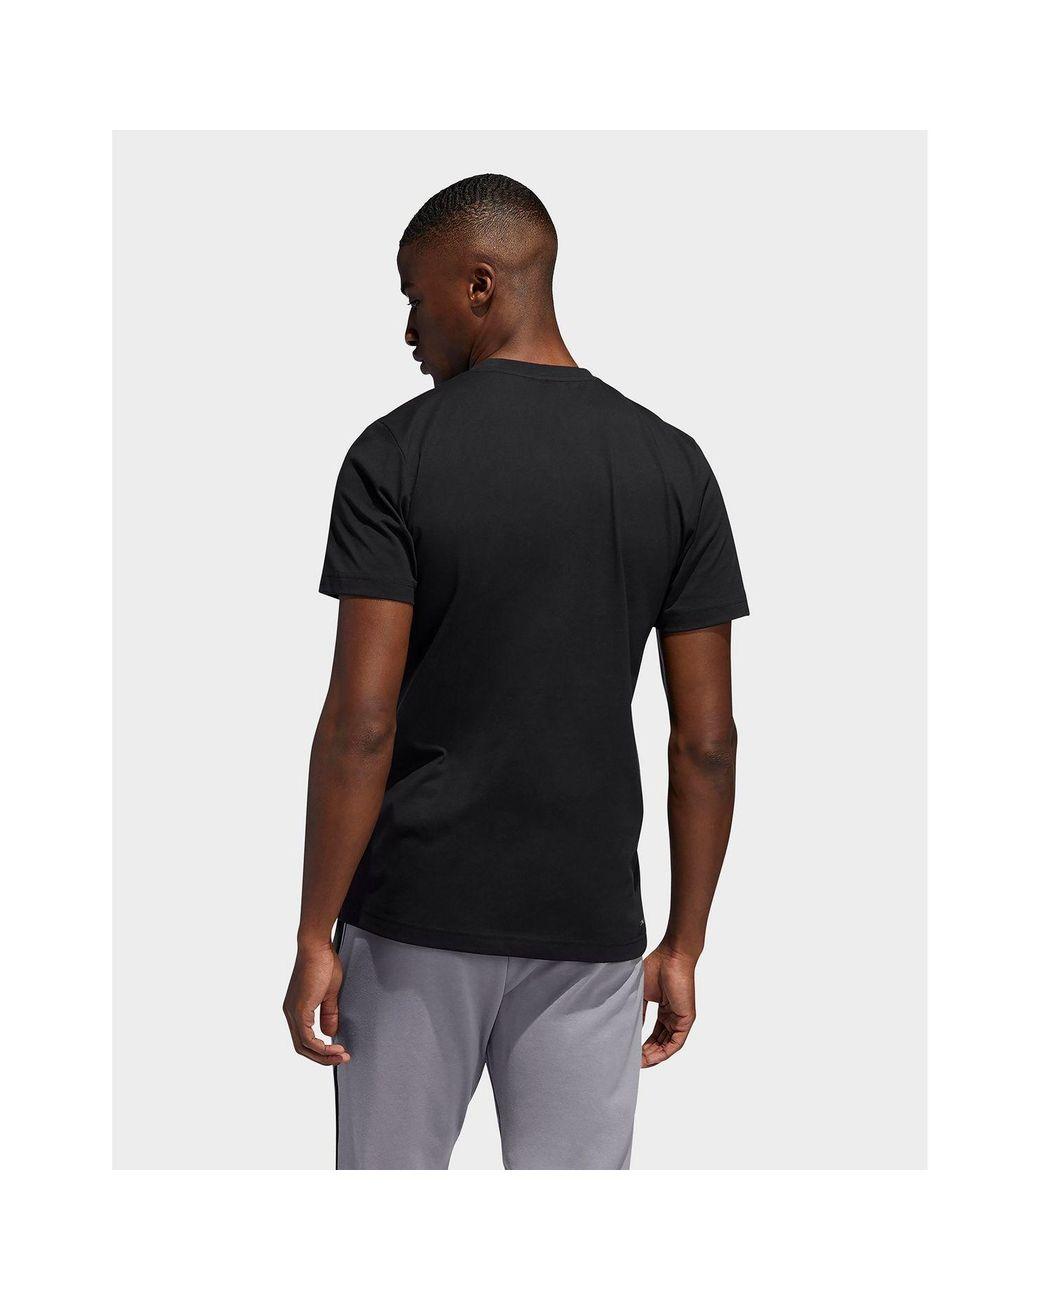 hieno tyyli halvin hinta pistorasia adidas Originals Cotton Donovan Mitchell Logo T-shirt in ...